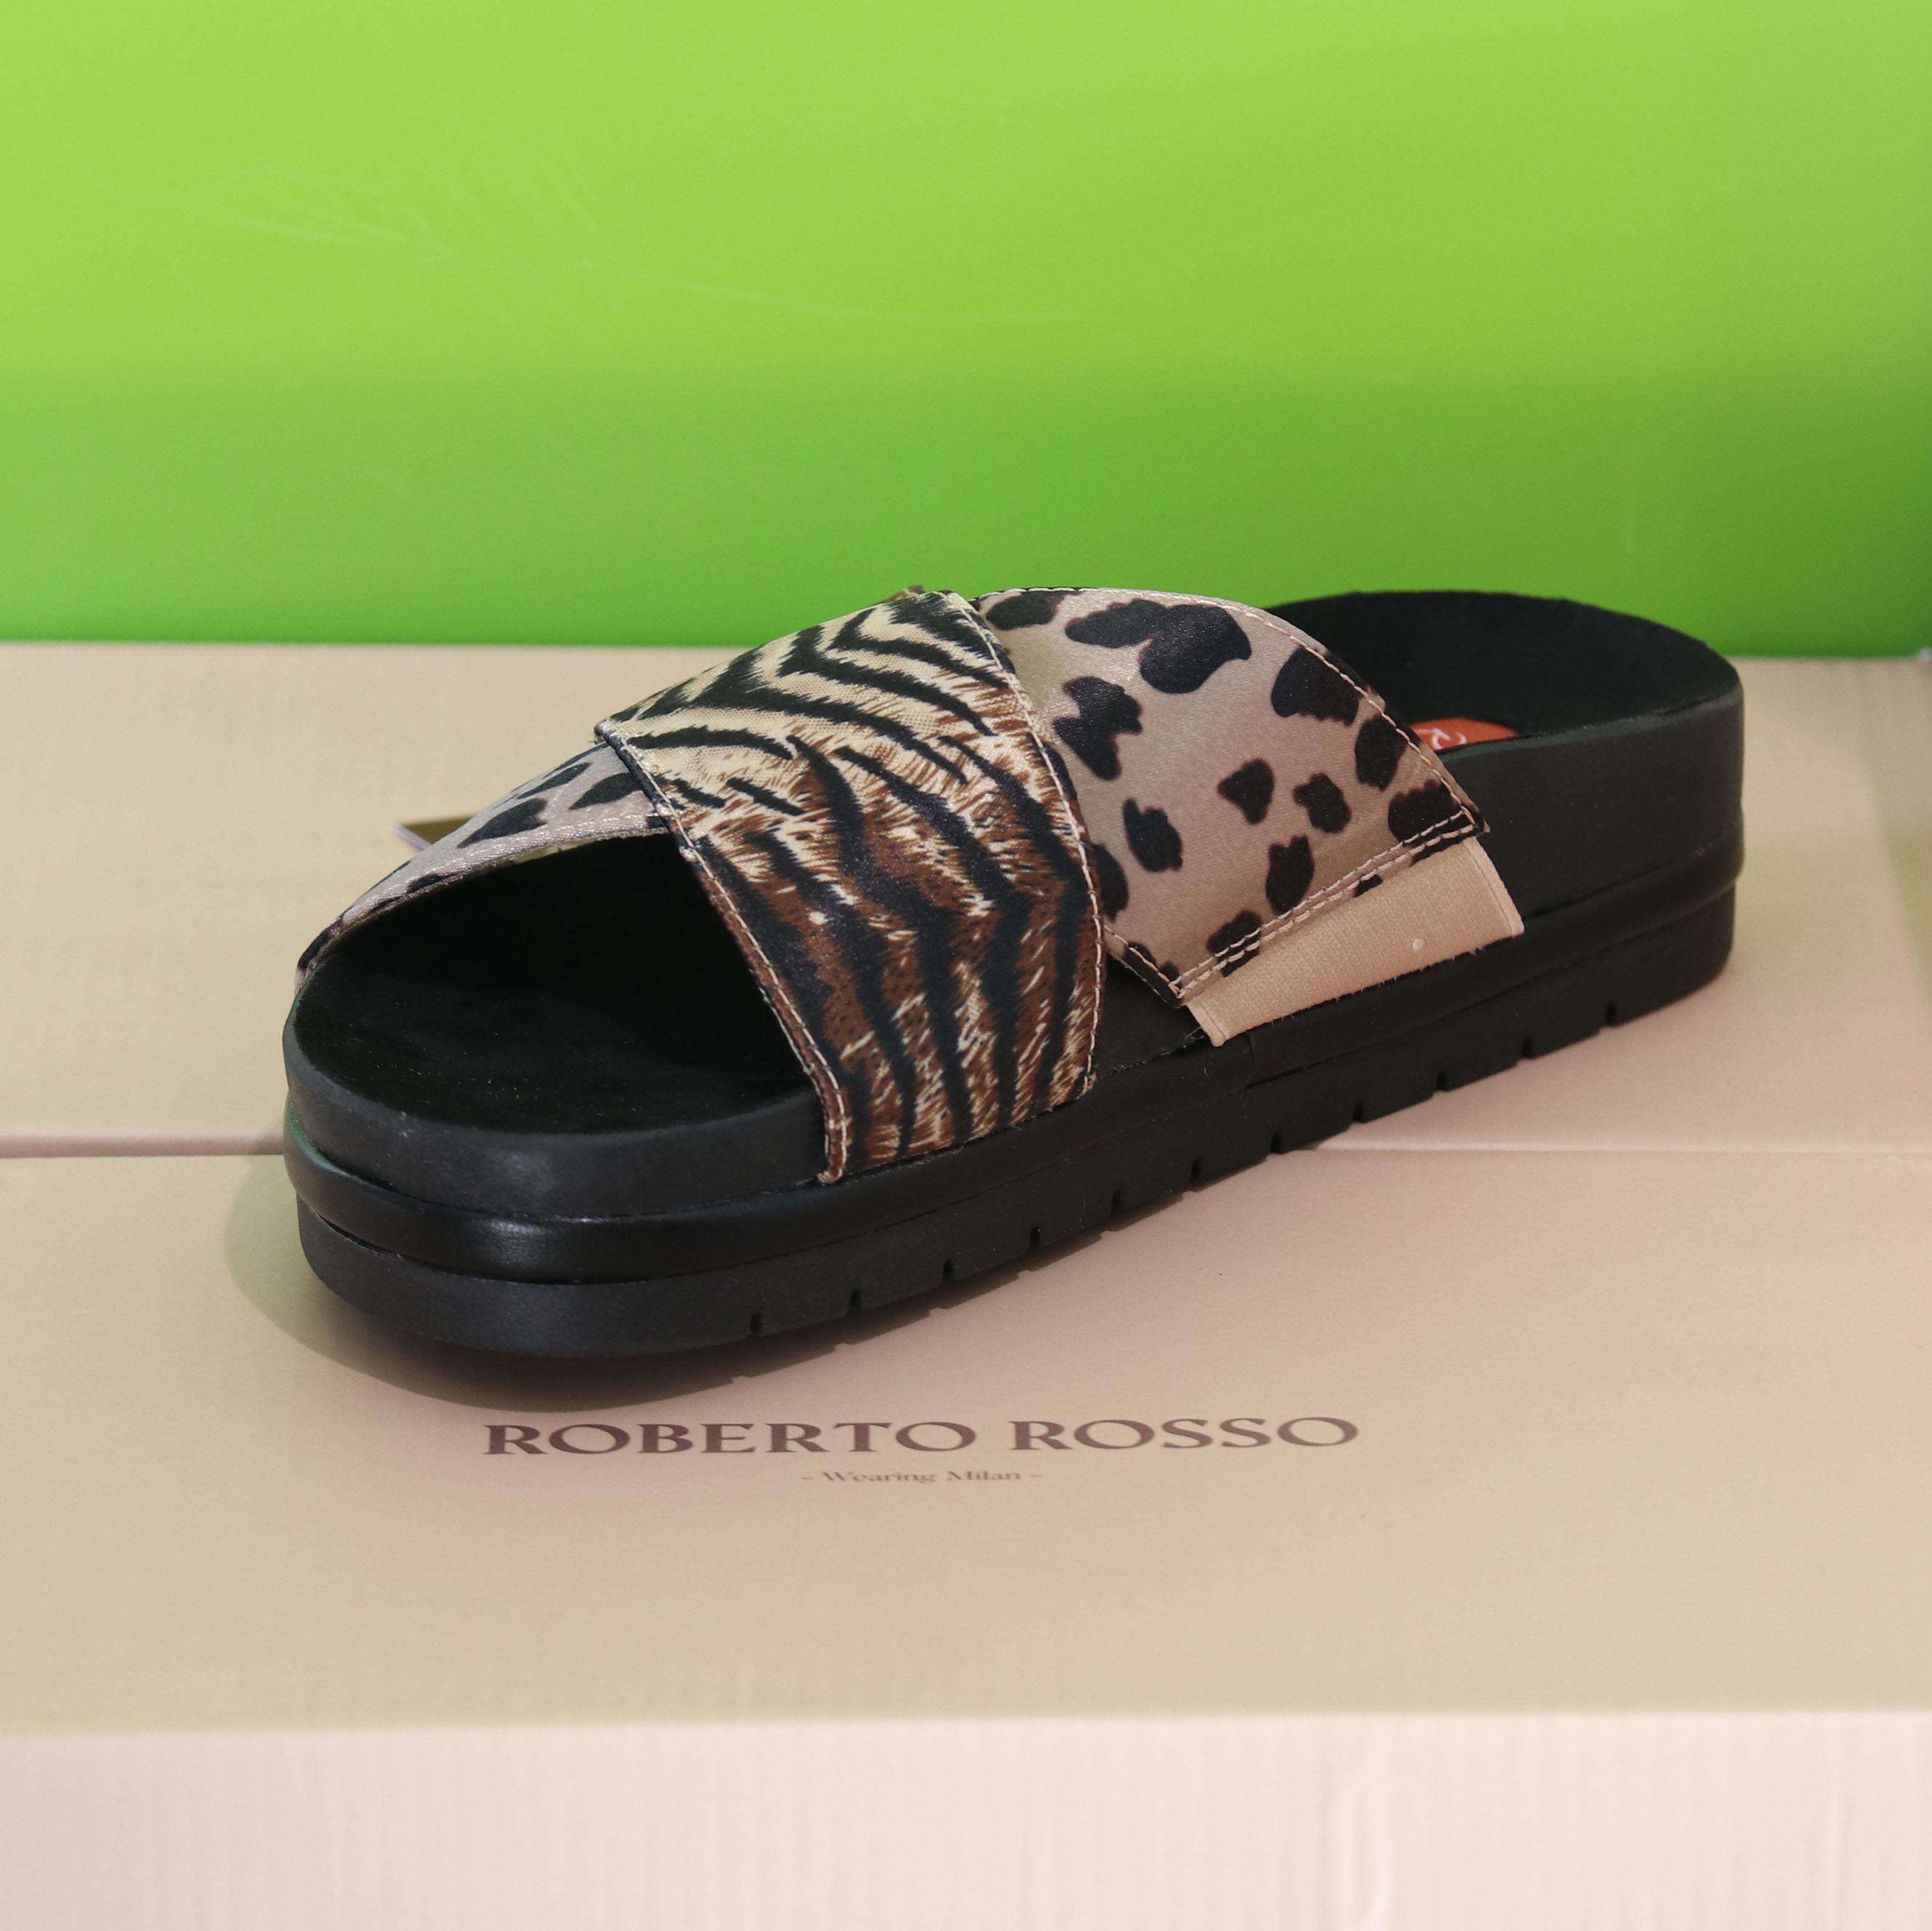 roberto rosso – oreadi leopard slippers sommer dame3